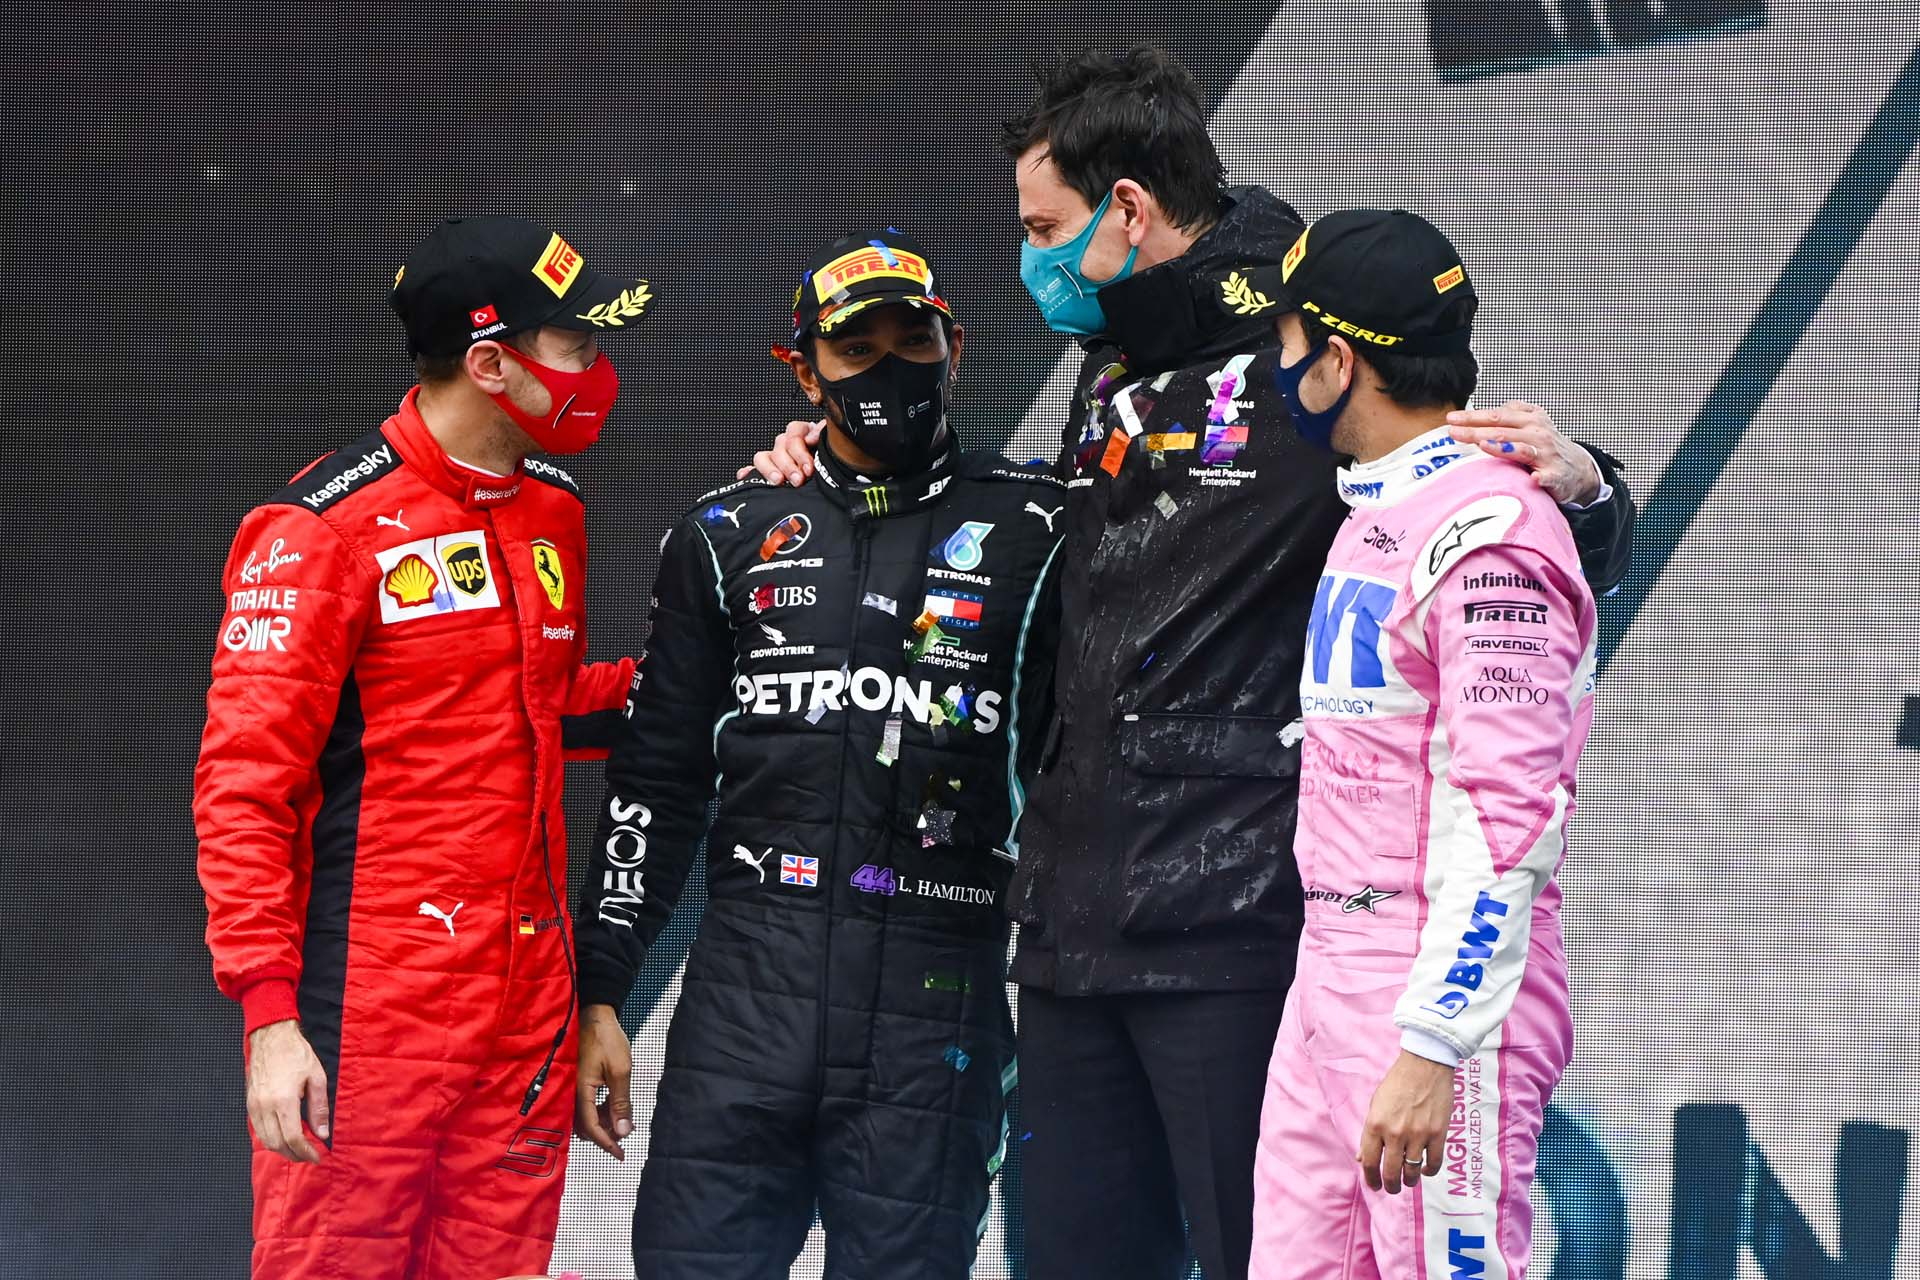 2020TurkishGPSaturday_RacingP_GP2014_131749_MS29546